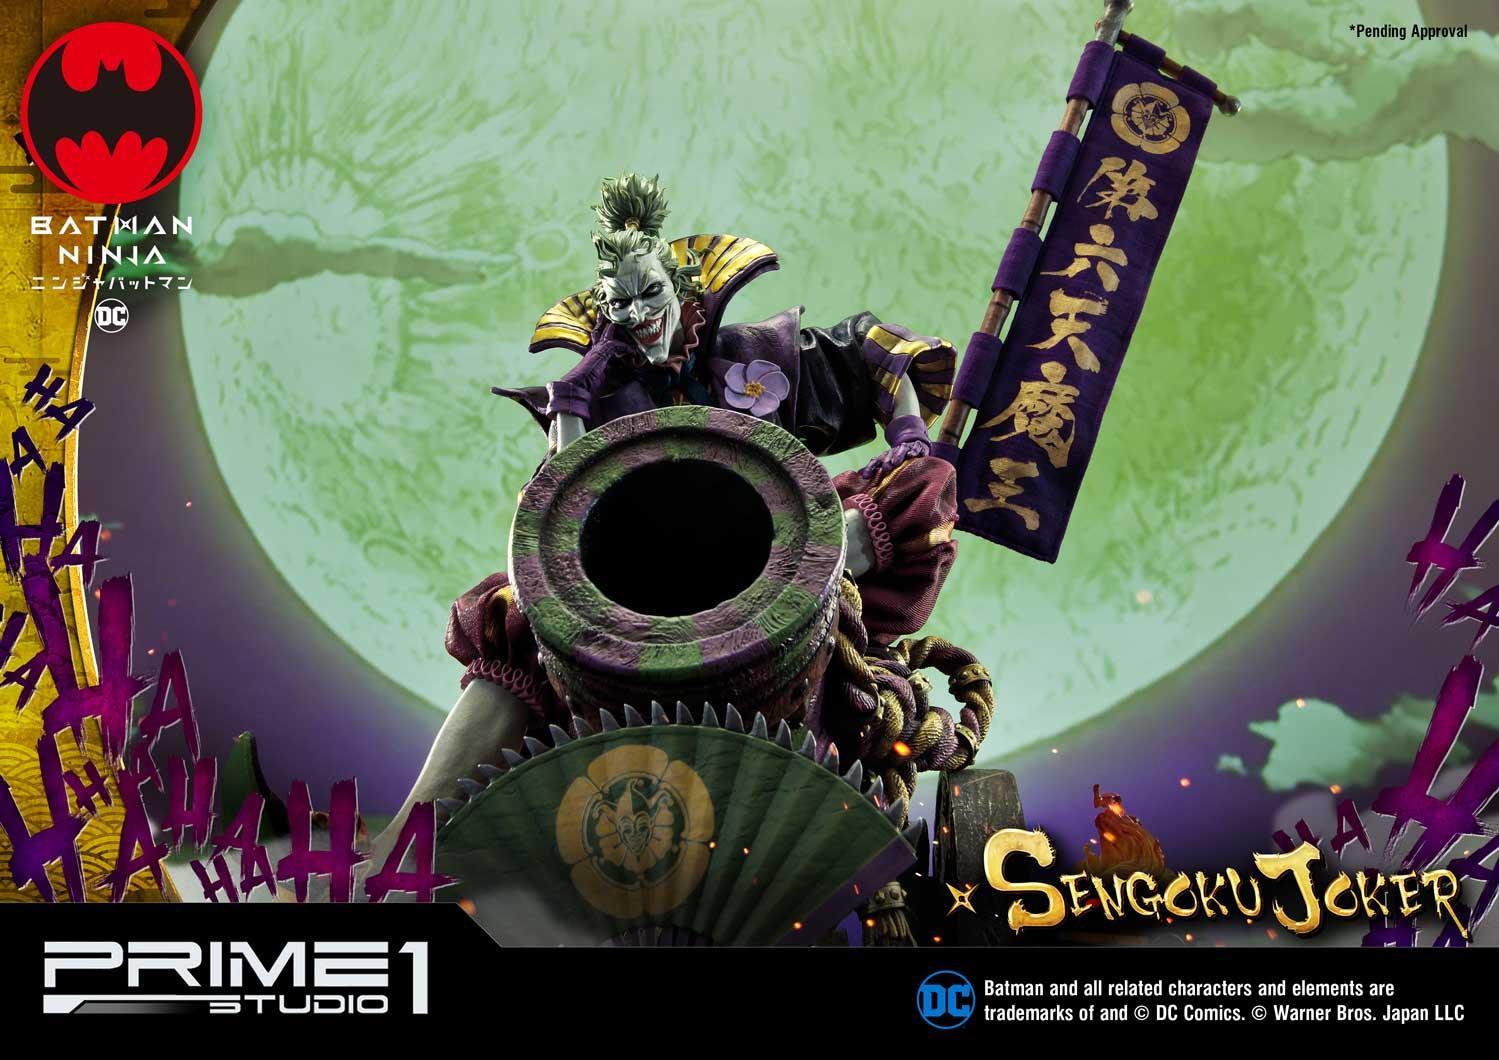 Prime 1 Studio Announces Sengoku Joker Statue Batman News